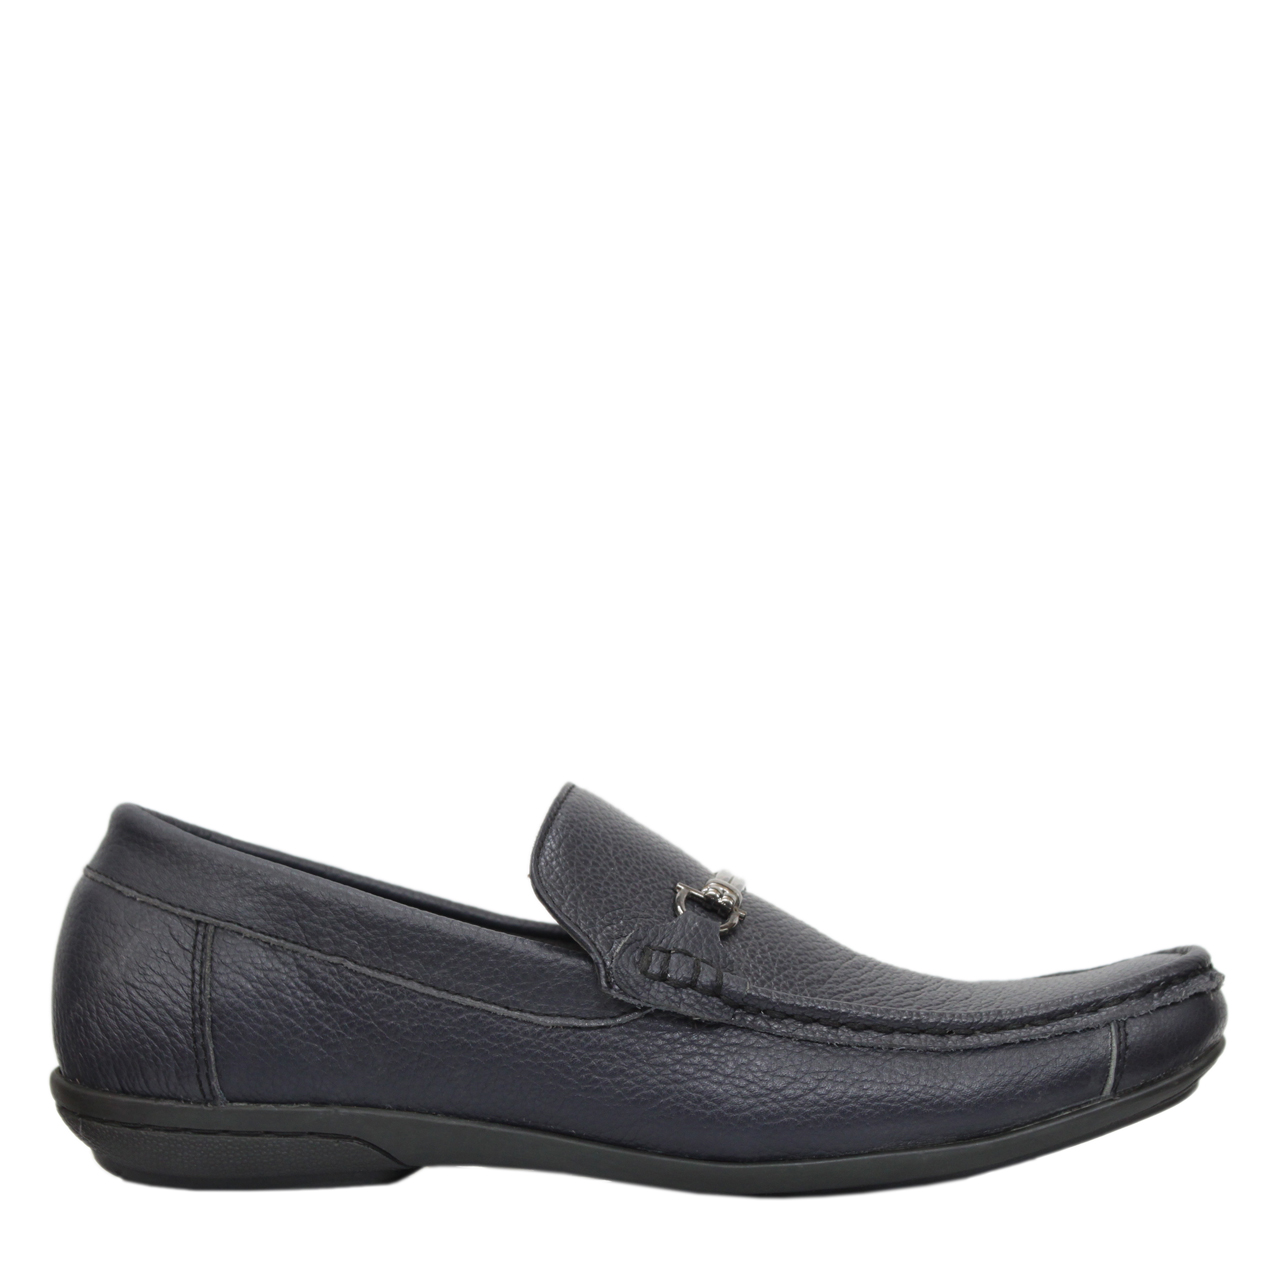 Giày nam da bò B862a